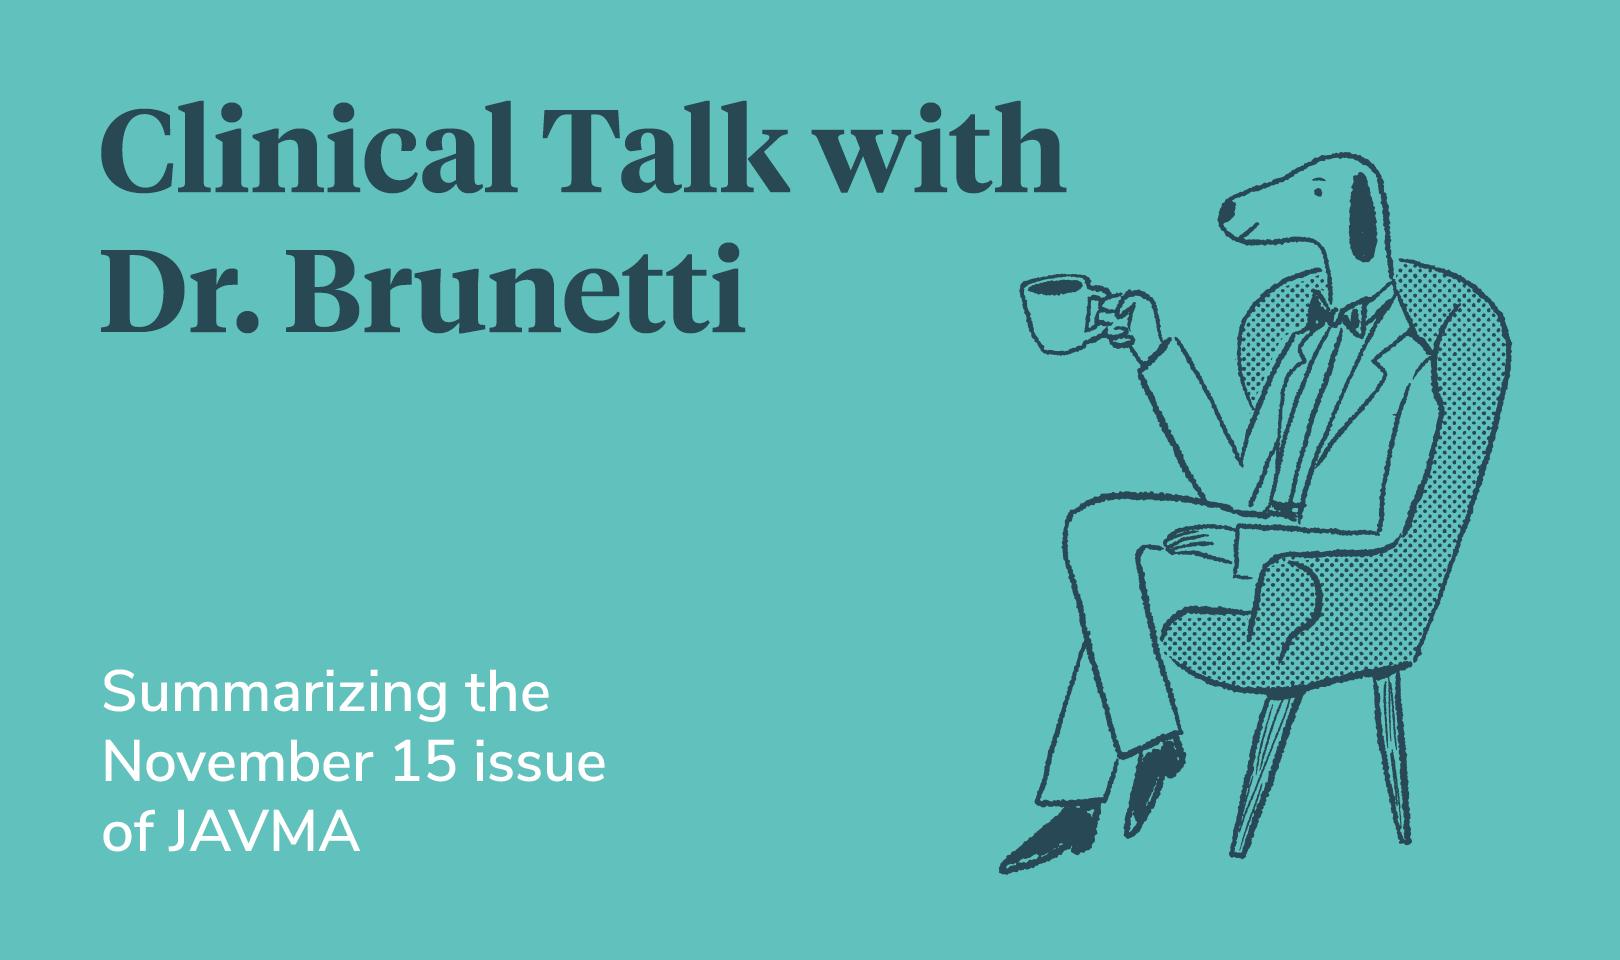 Clinical talk - November 2020